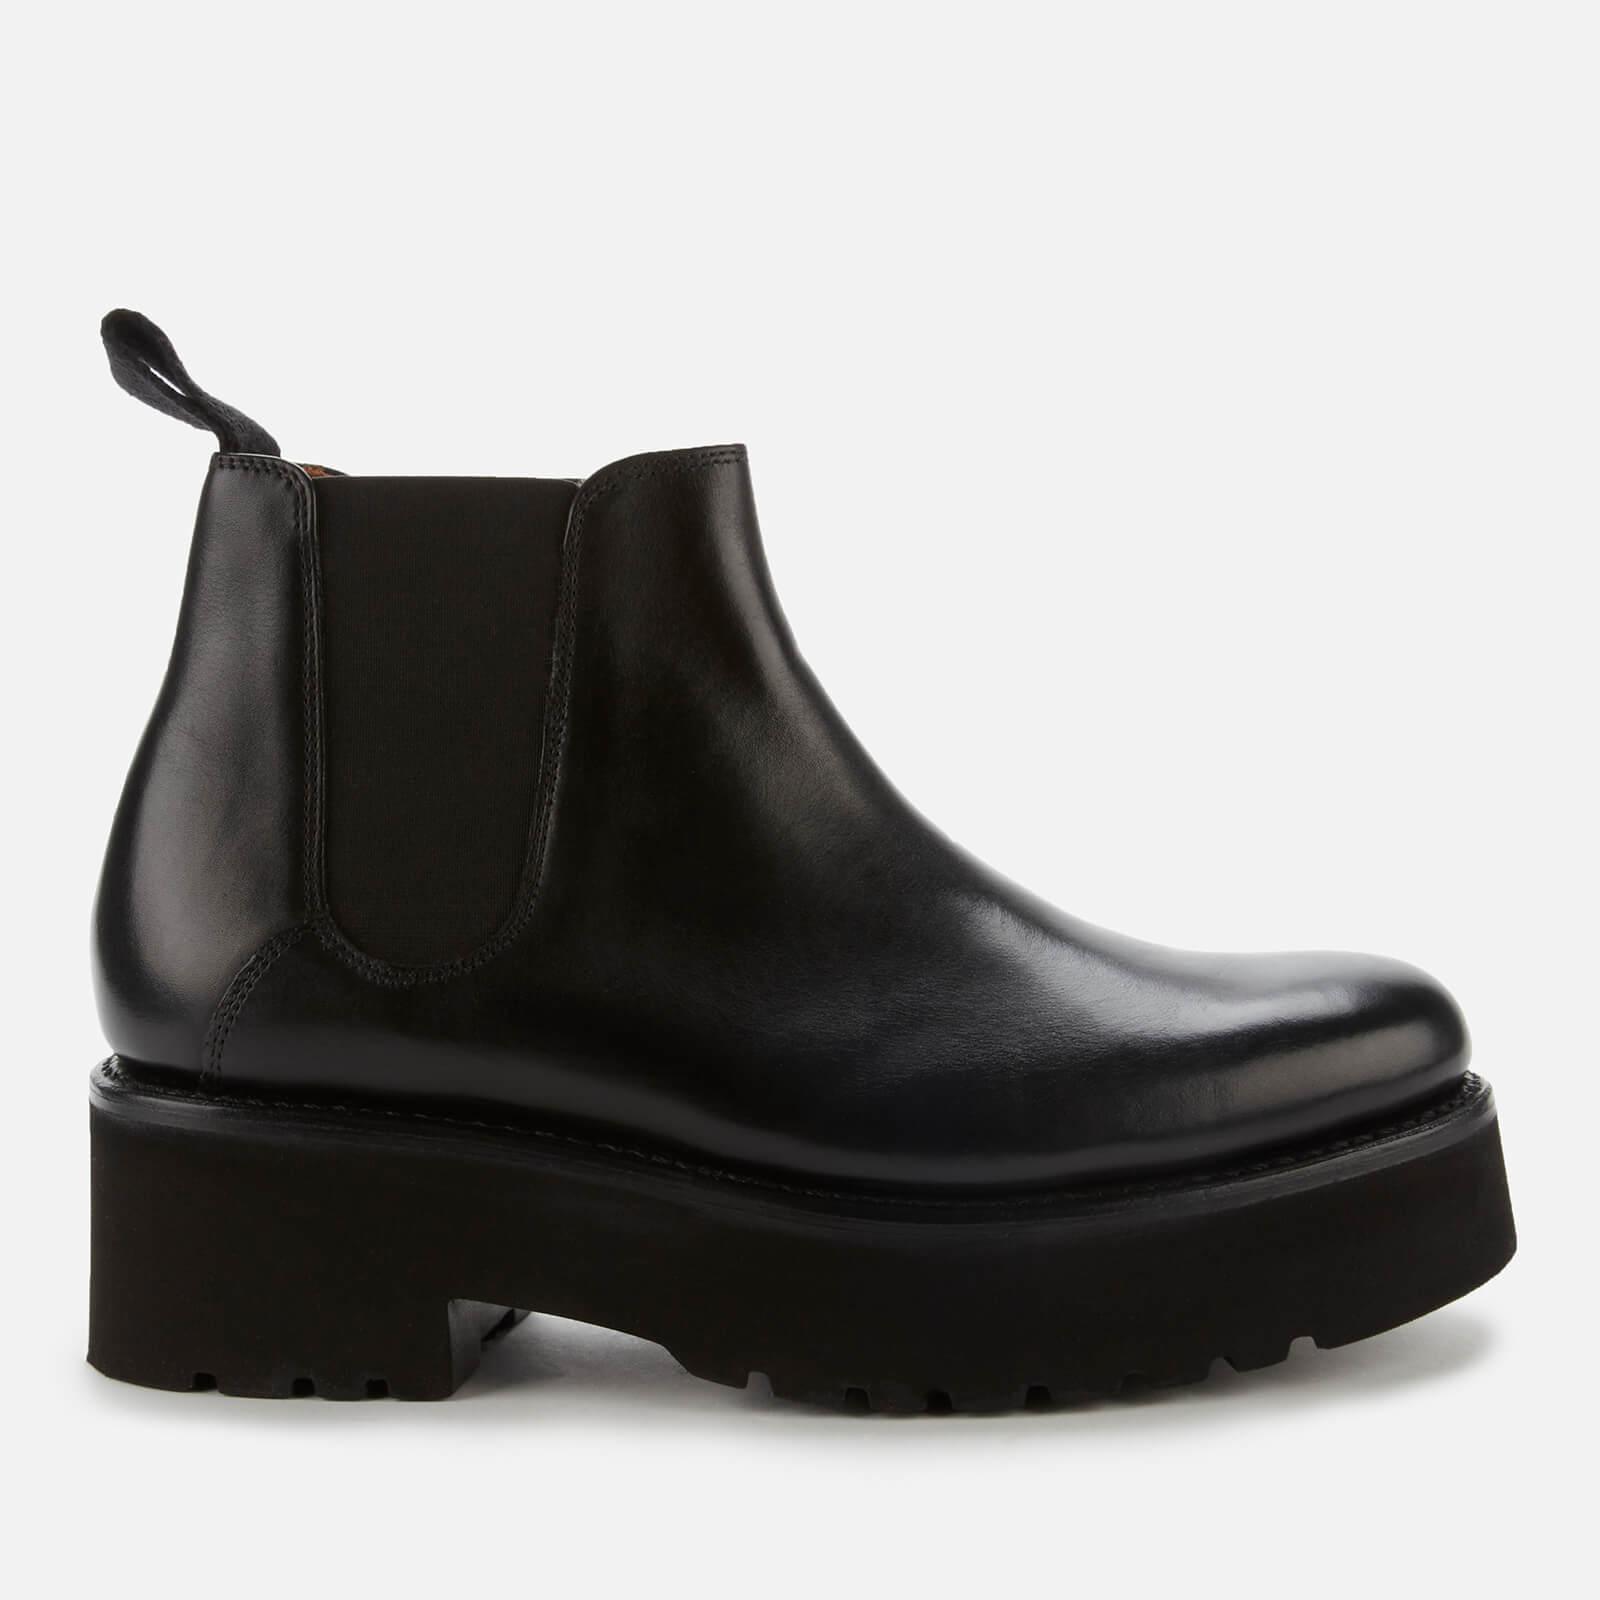 Grenson Women's Naomi Leather Chelsea Boots - Black - Uk  8